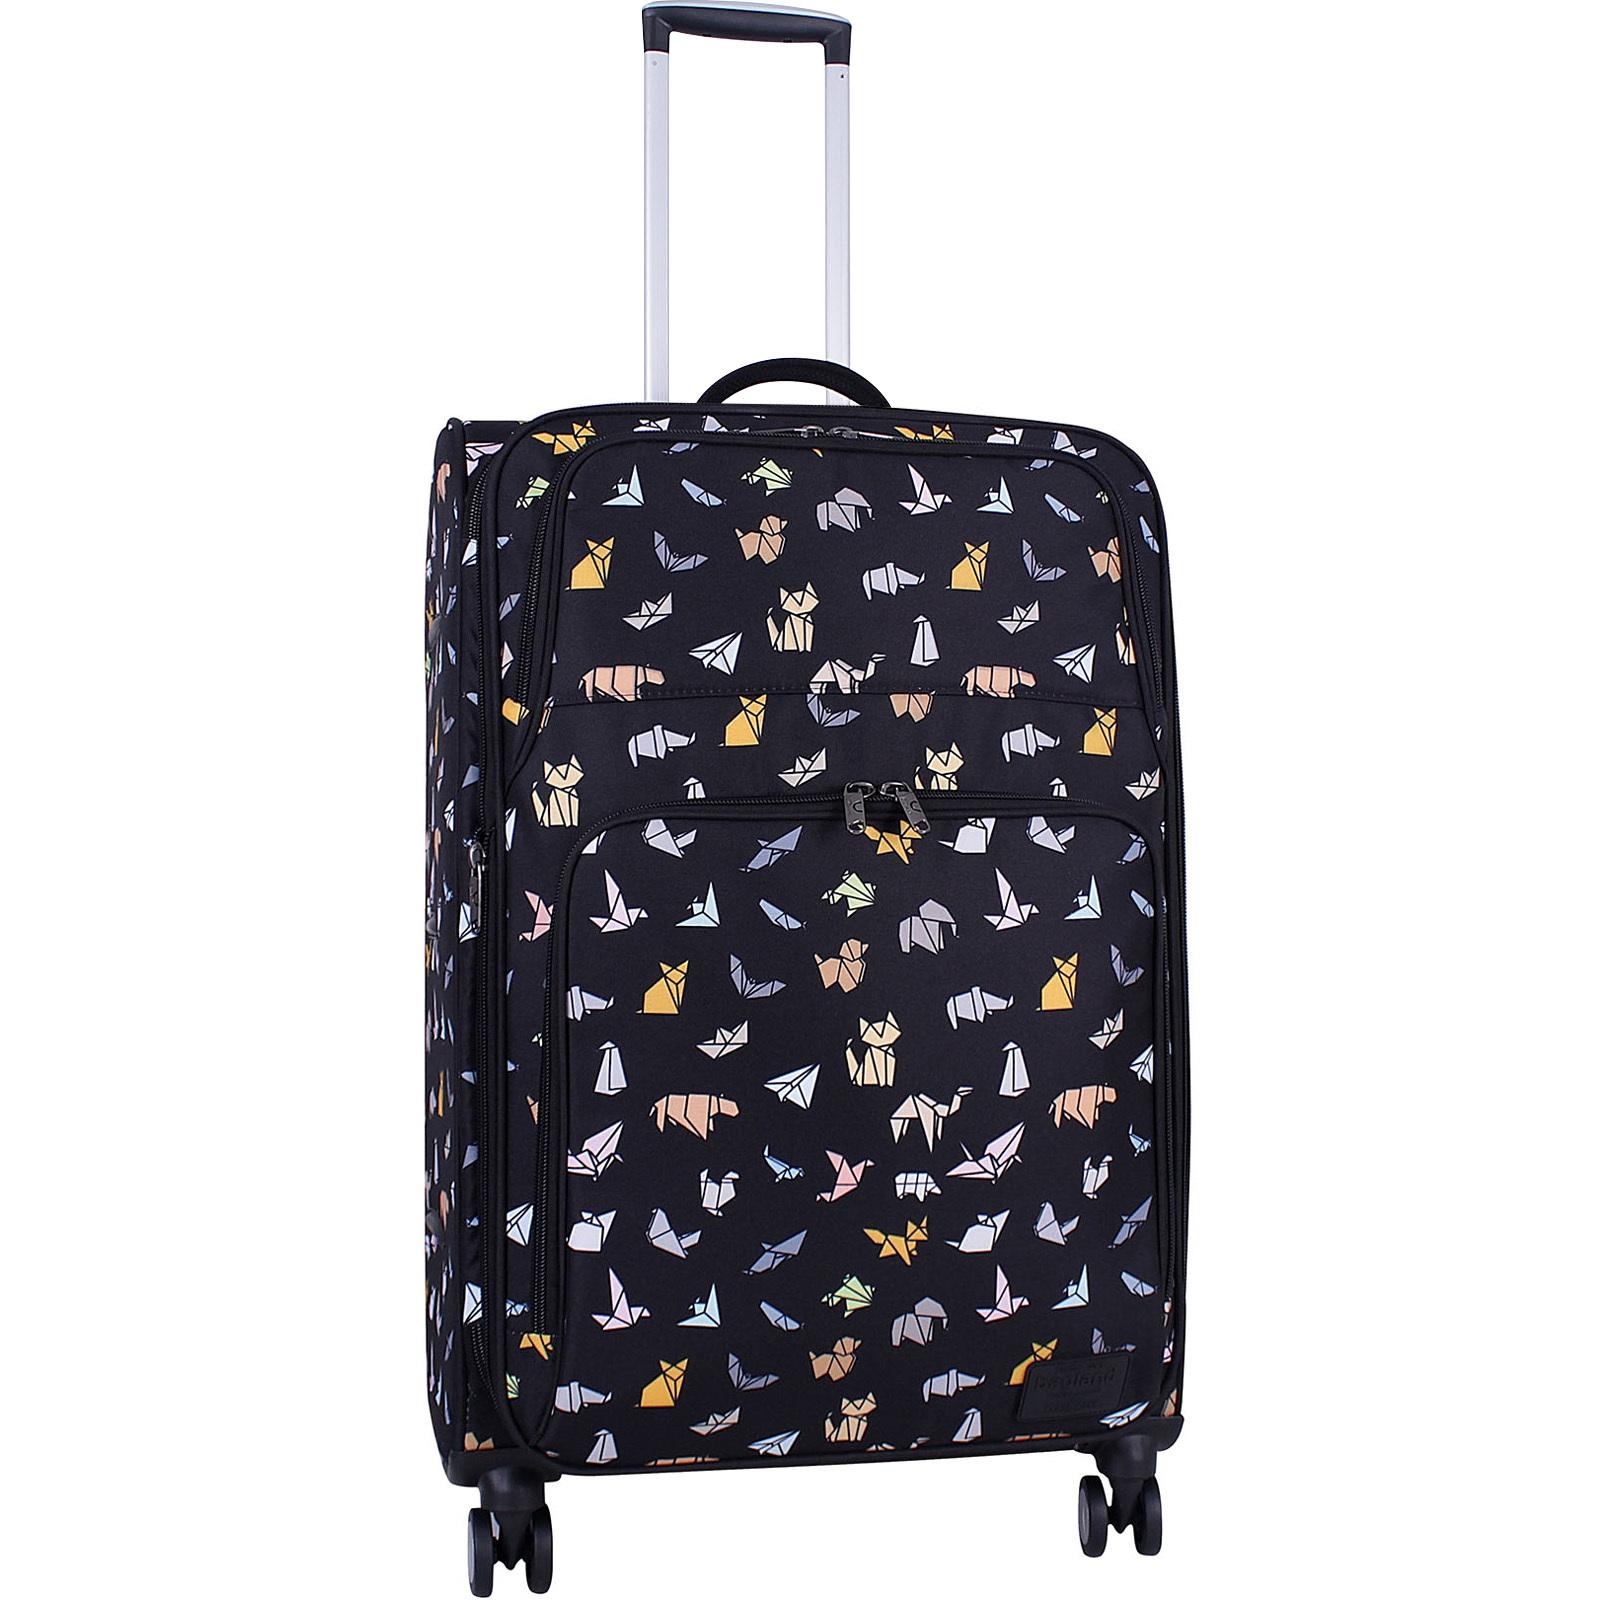 Дорожные чемоданы Чемодан Bagland Валенсия большой дизайн 83л. сублімація 752 (0037966274) IMG_8721_суб.752_.JPG